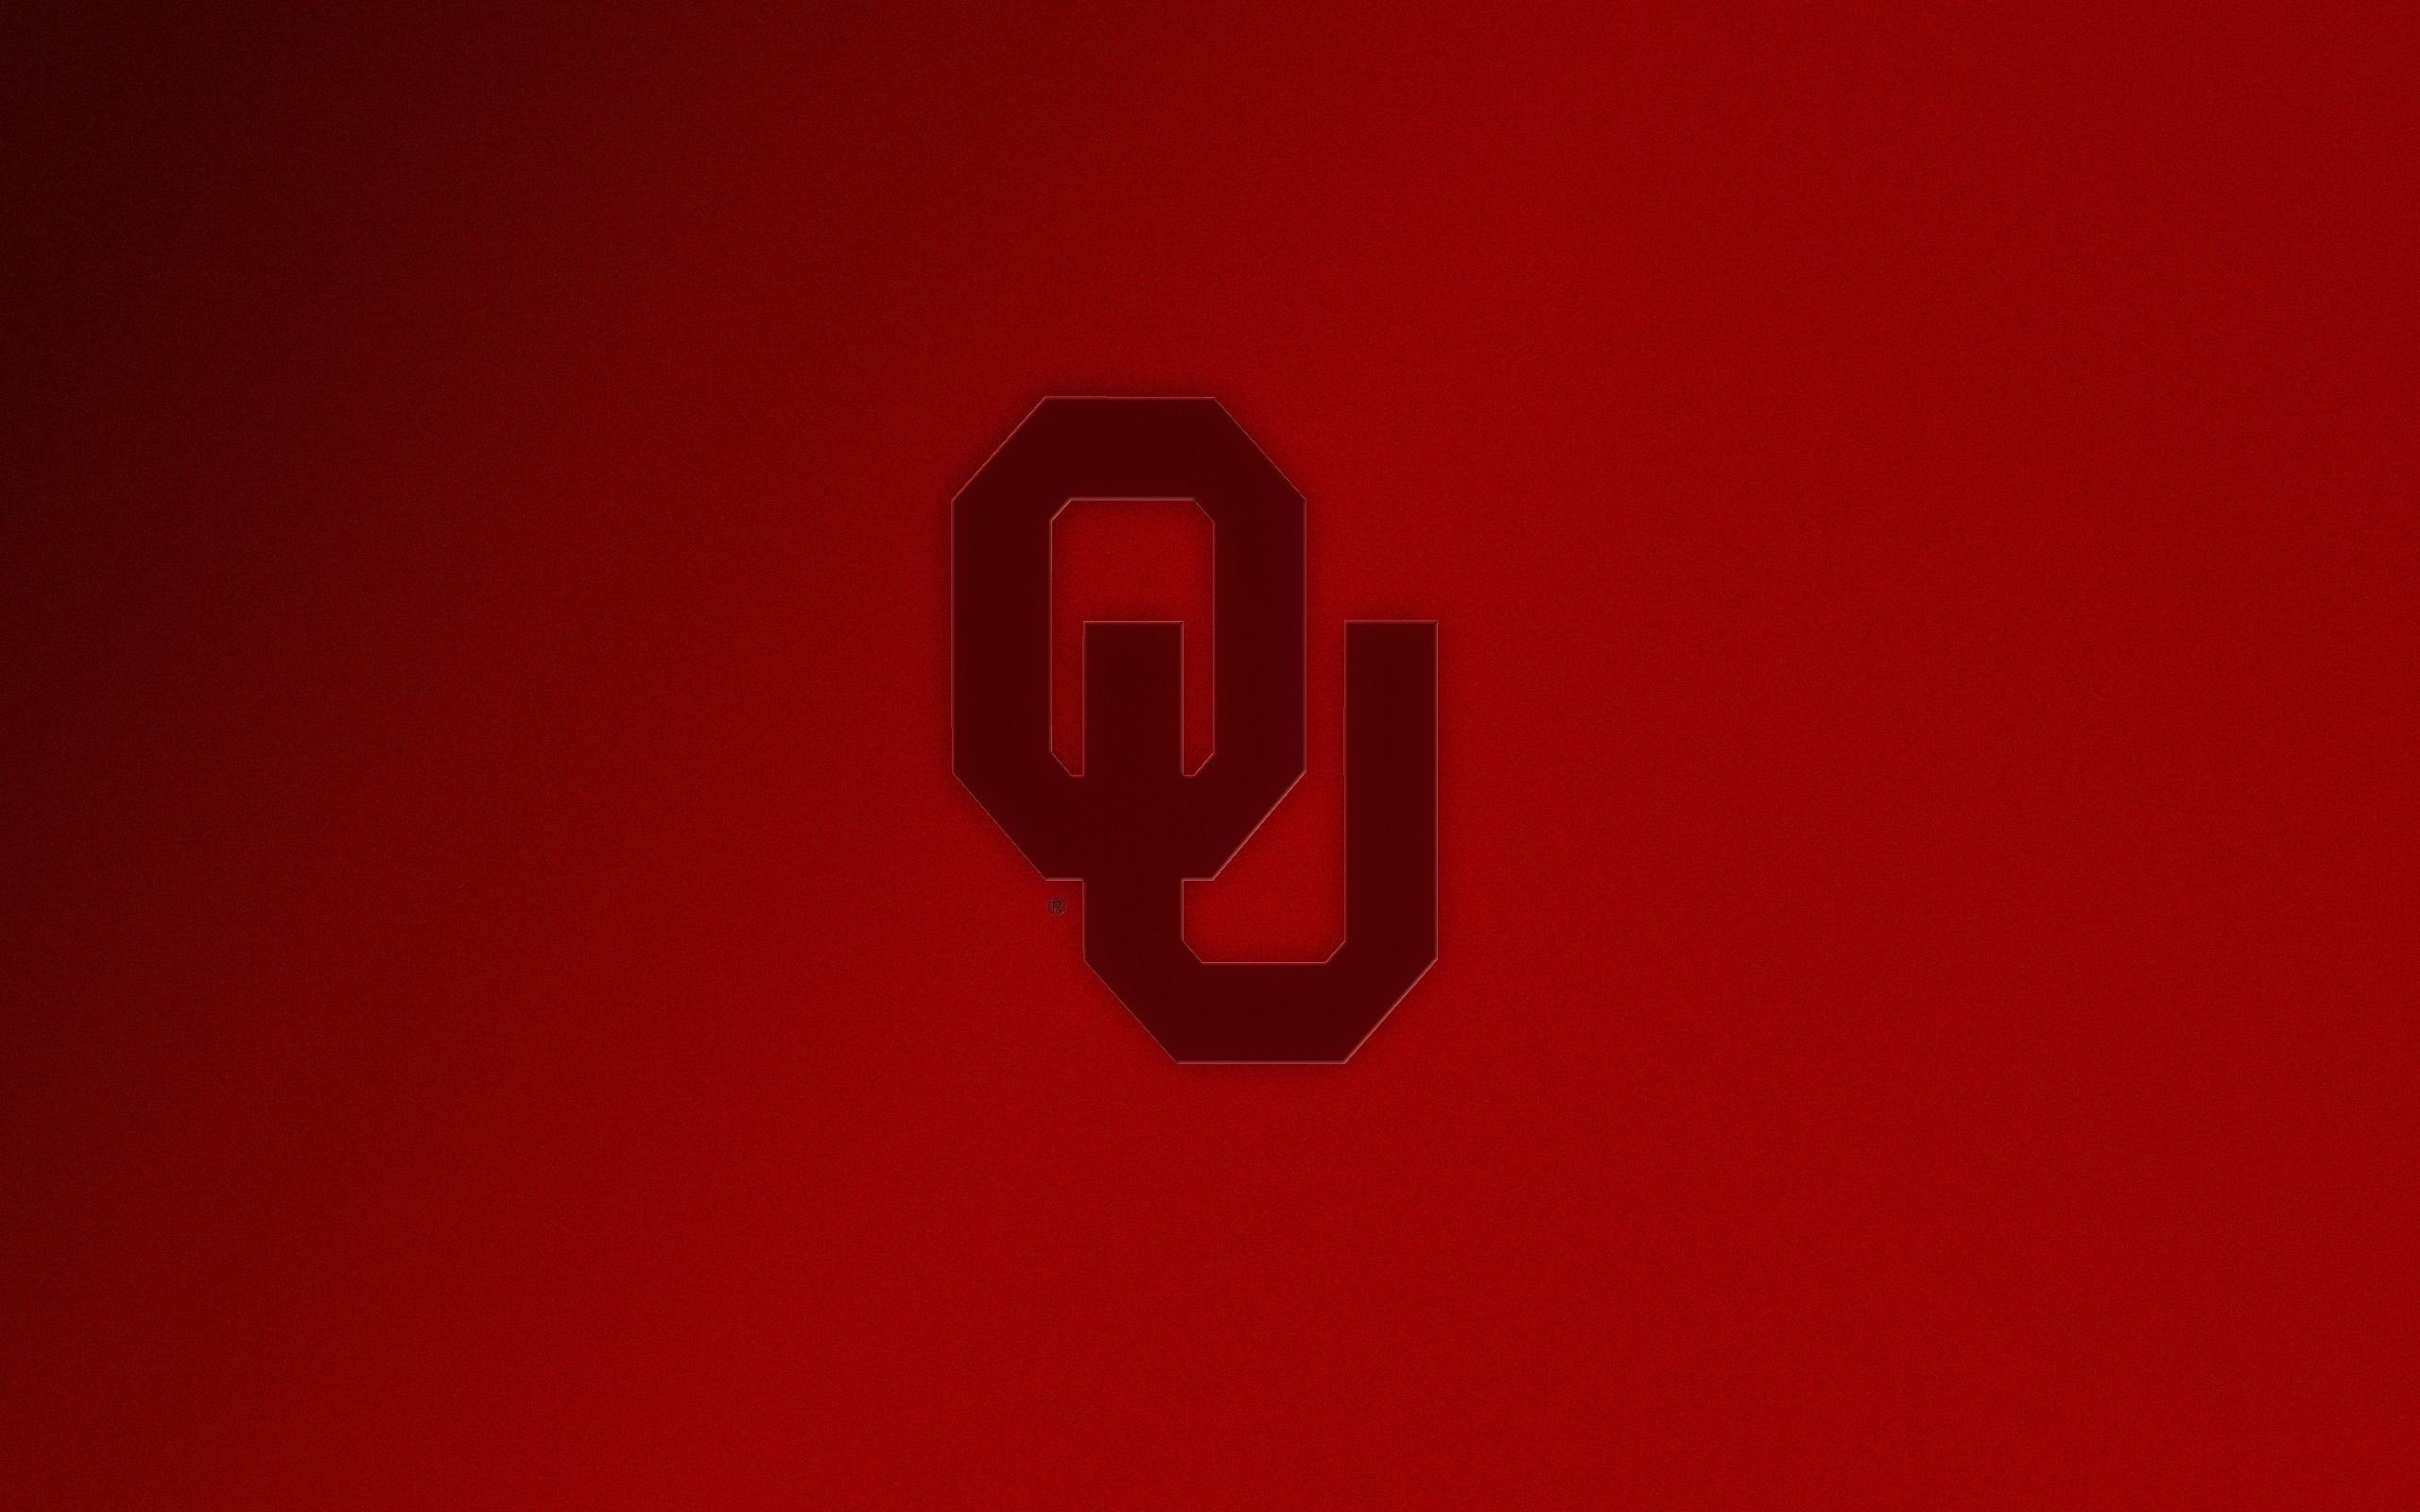 Oklahoma Sooners Wallpaper and Screensavers 2560x1600